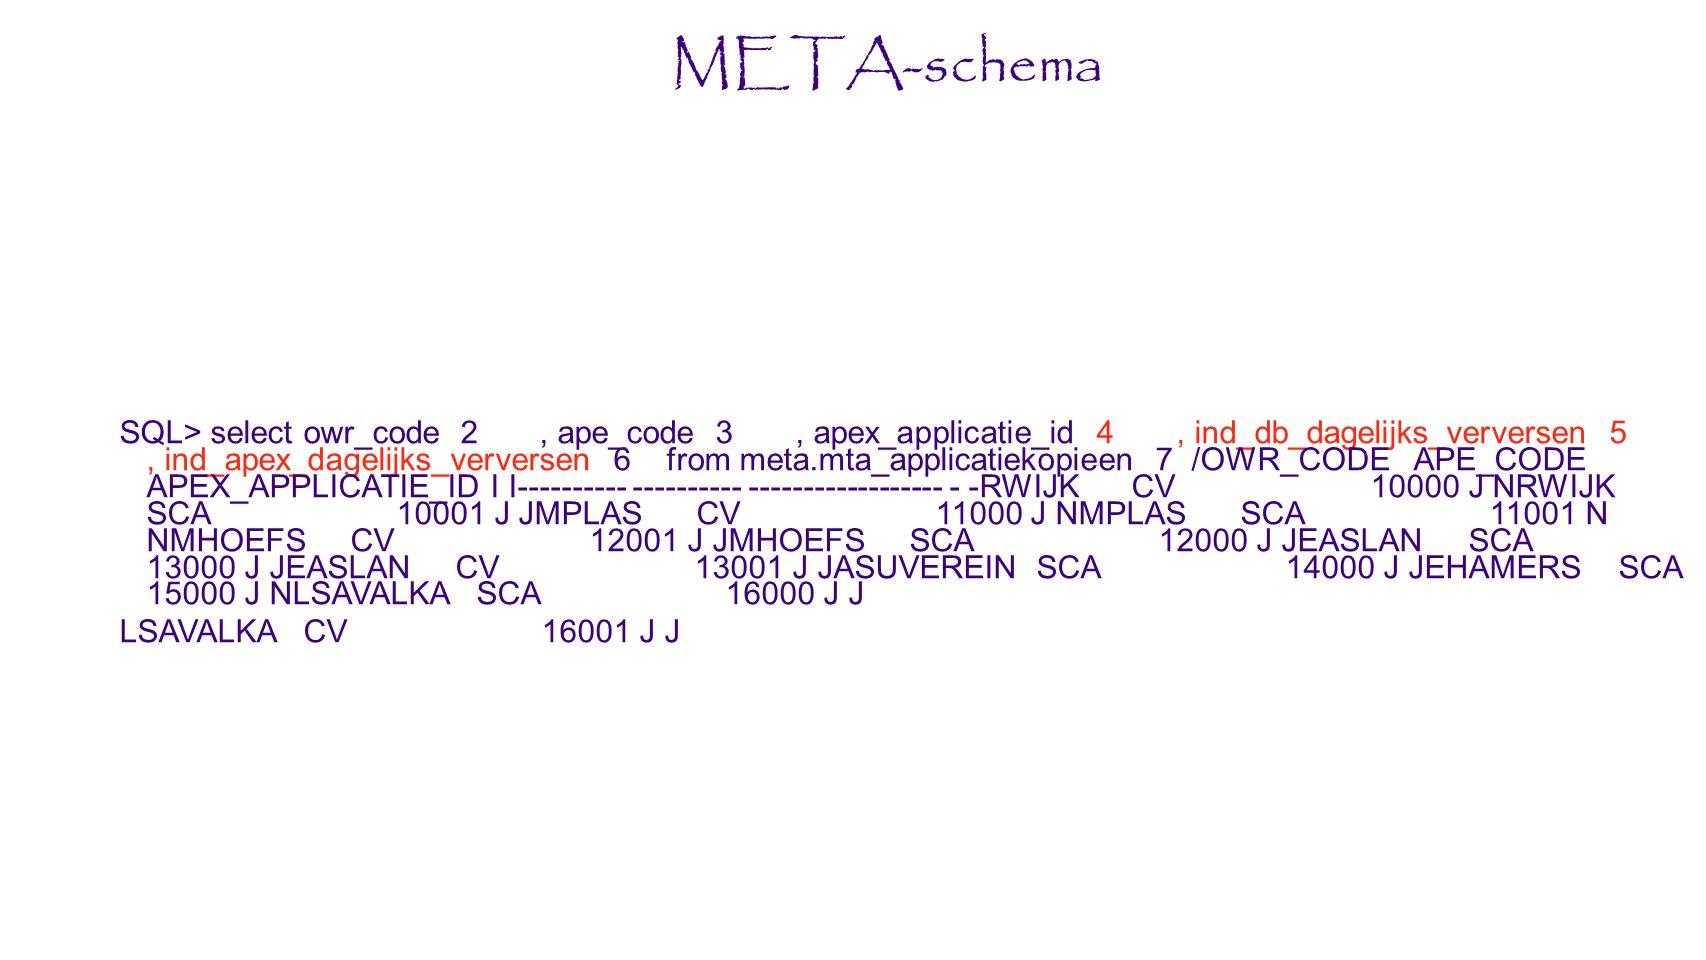 META-schema SQL> select owr_code 2, ape_code 3, apex_applicatie_id 4, ind_db_dagelijks_verversen 5, ind_apex_dagelijks_verversen 6 from meta.mta_applicatiekopieen 7 /OWR_CODE APE_CODE APEX_APPLICATIE_ID I I---------- ---------- ------------------ - -RWIJK CV 10000 J NRWIJK SCA 10001 J JMPLAS CV 11000 J NMPLAS SCA 11001 N NMHOEFS CV 12001 J JMHOEFS SCA 12000 J JEASLAN SCA 13000 J JEASLAN CV 13001 J JASUVEREIN SCA 14000 J JEHAMERS SCA 15000 J NLSAVALKA SCA 16000 J J LSAVALKA CV 16001 J J